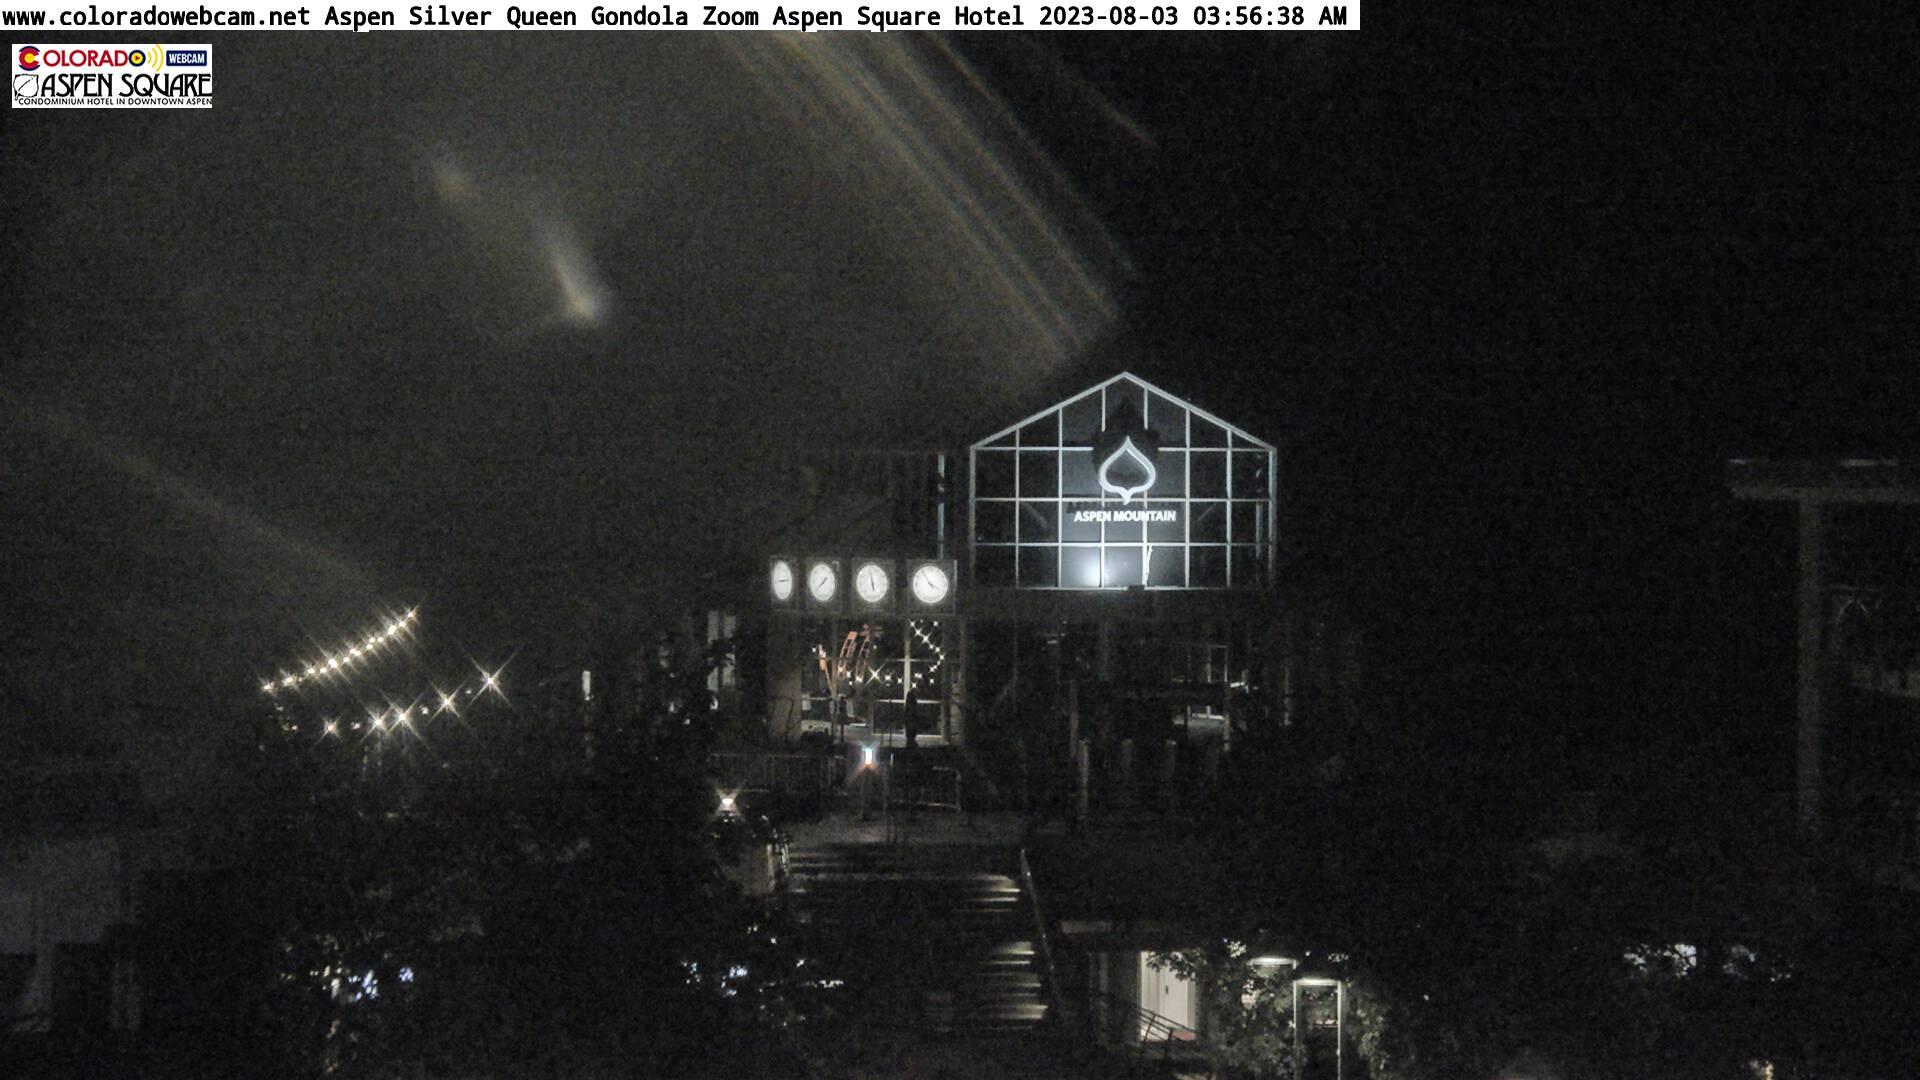 Aspen Colorado NEW PTZ Aspen Sliver Queen Gondola Live Aspen Webcam Snapshot